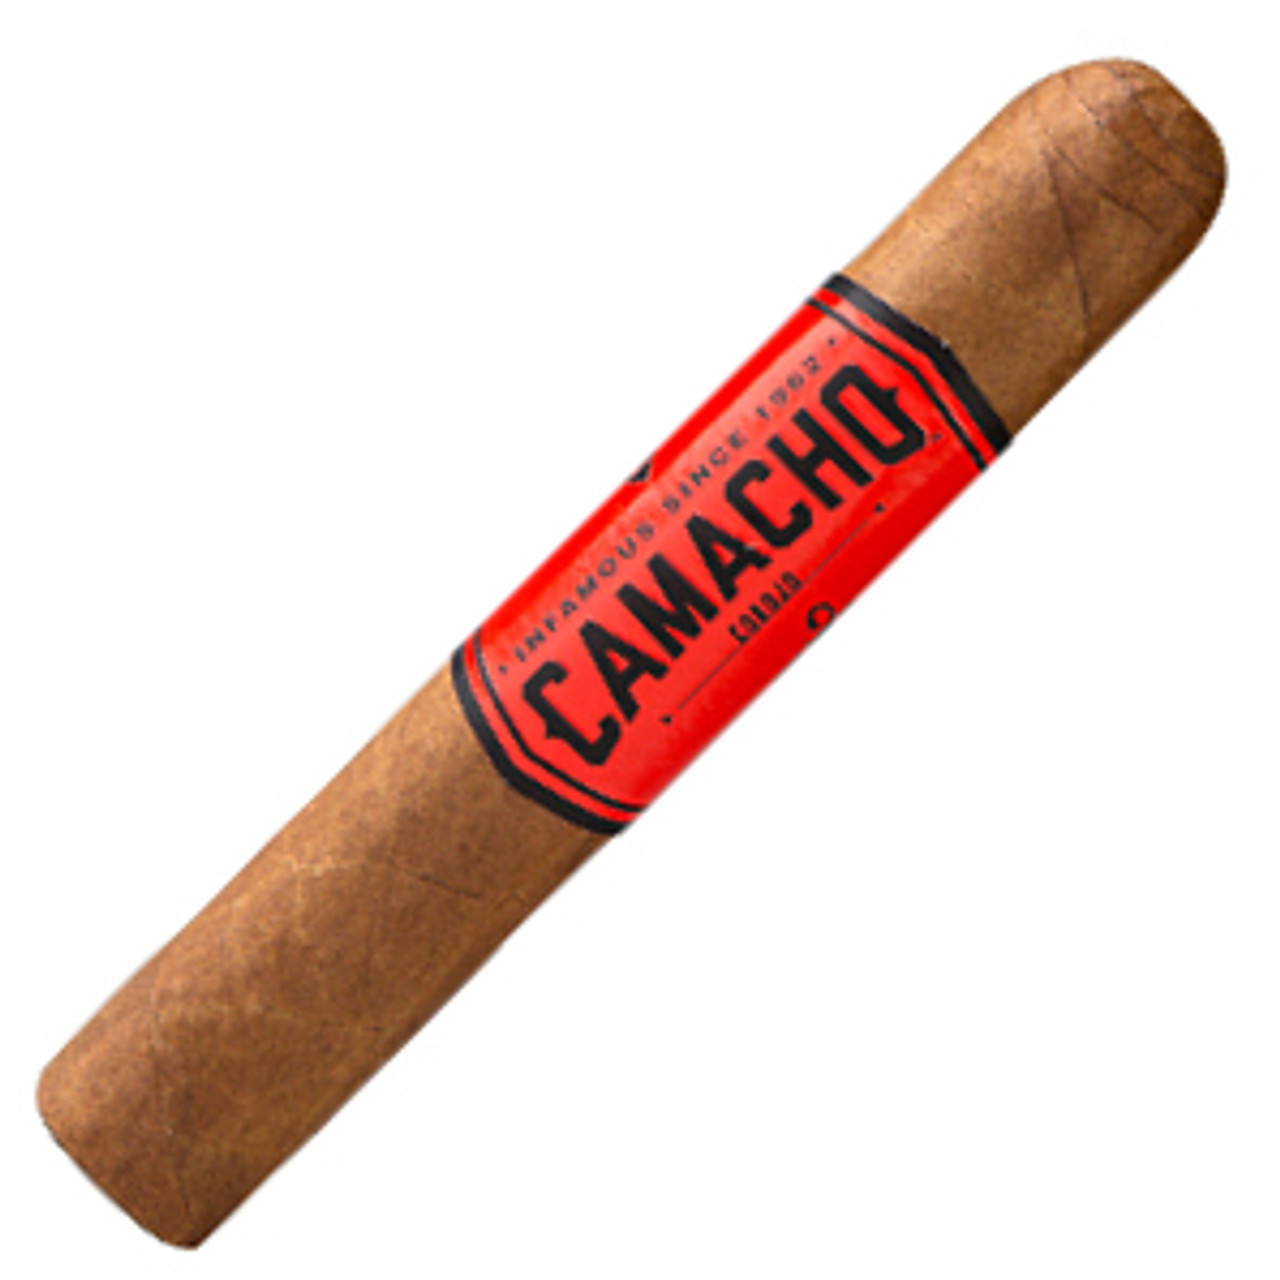 Camacho Corojo Robusto Cigars - 5 x 50 (Box of 20)